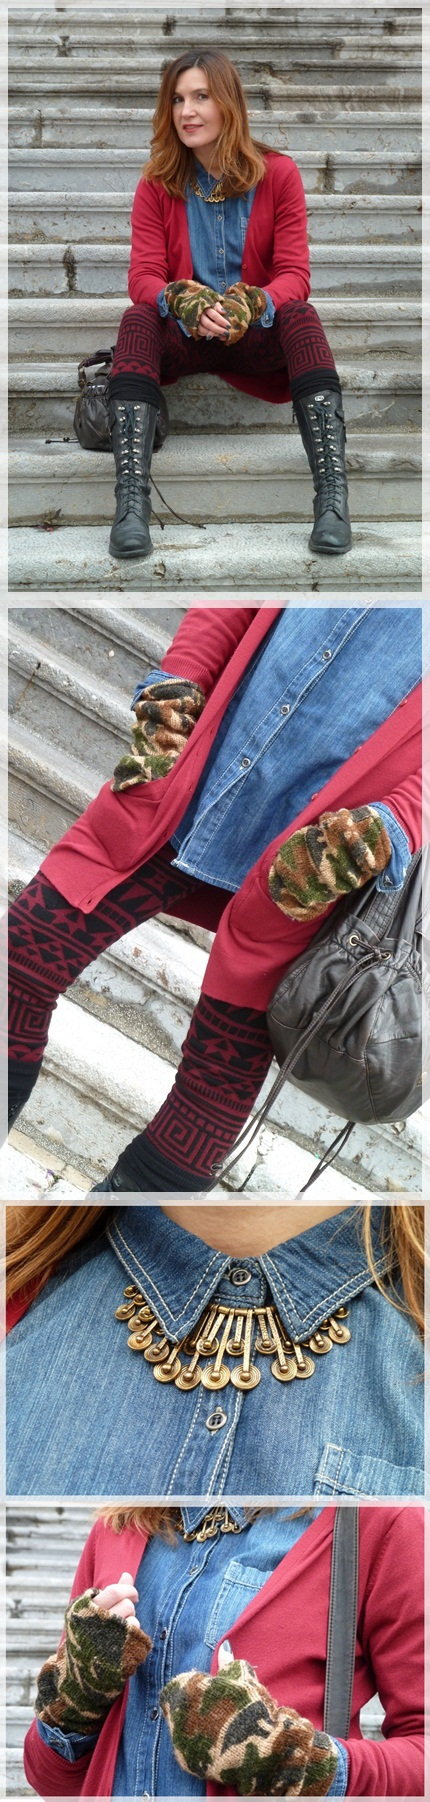 Alicia the way we look Bilbao